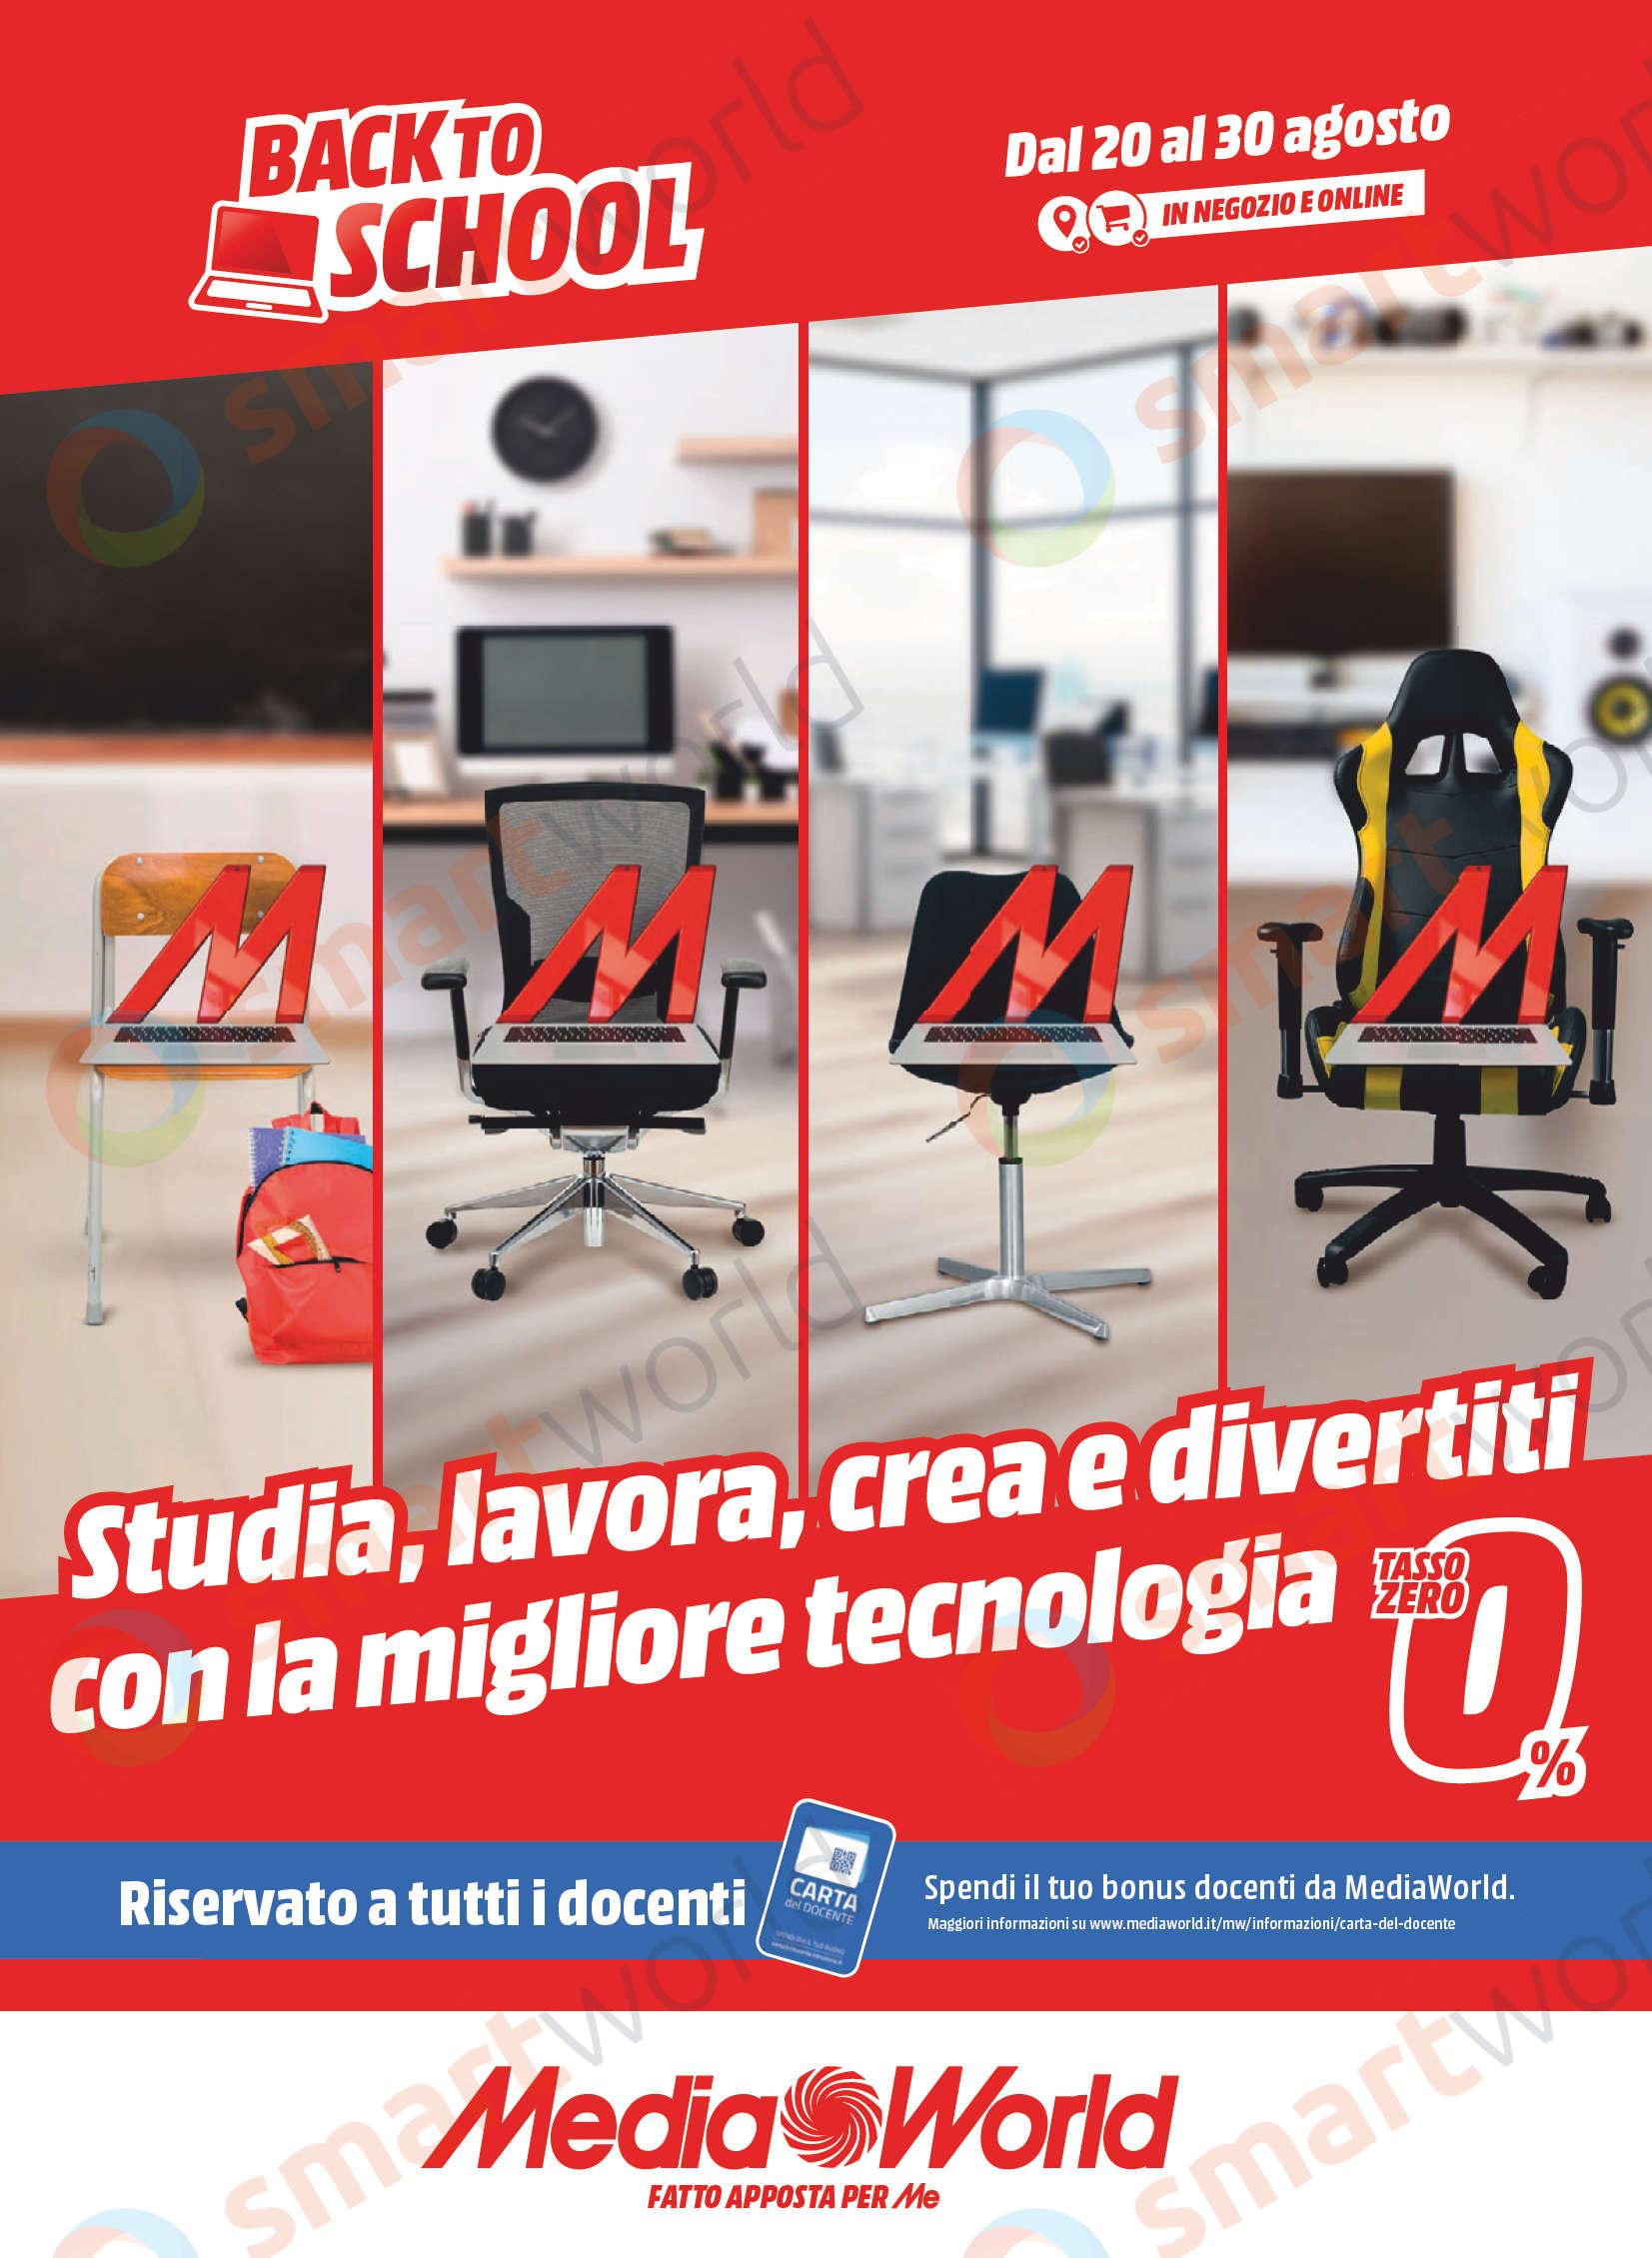 volantino mediaworld back to school 20-30 agosto 2020 (1)